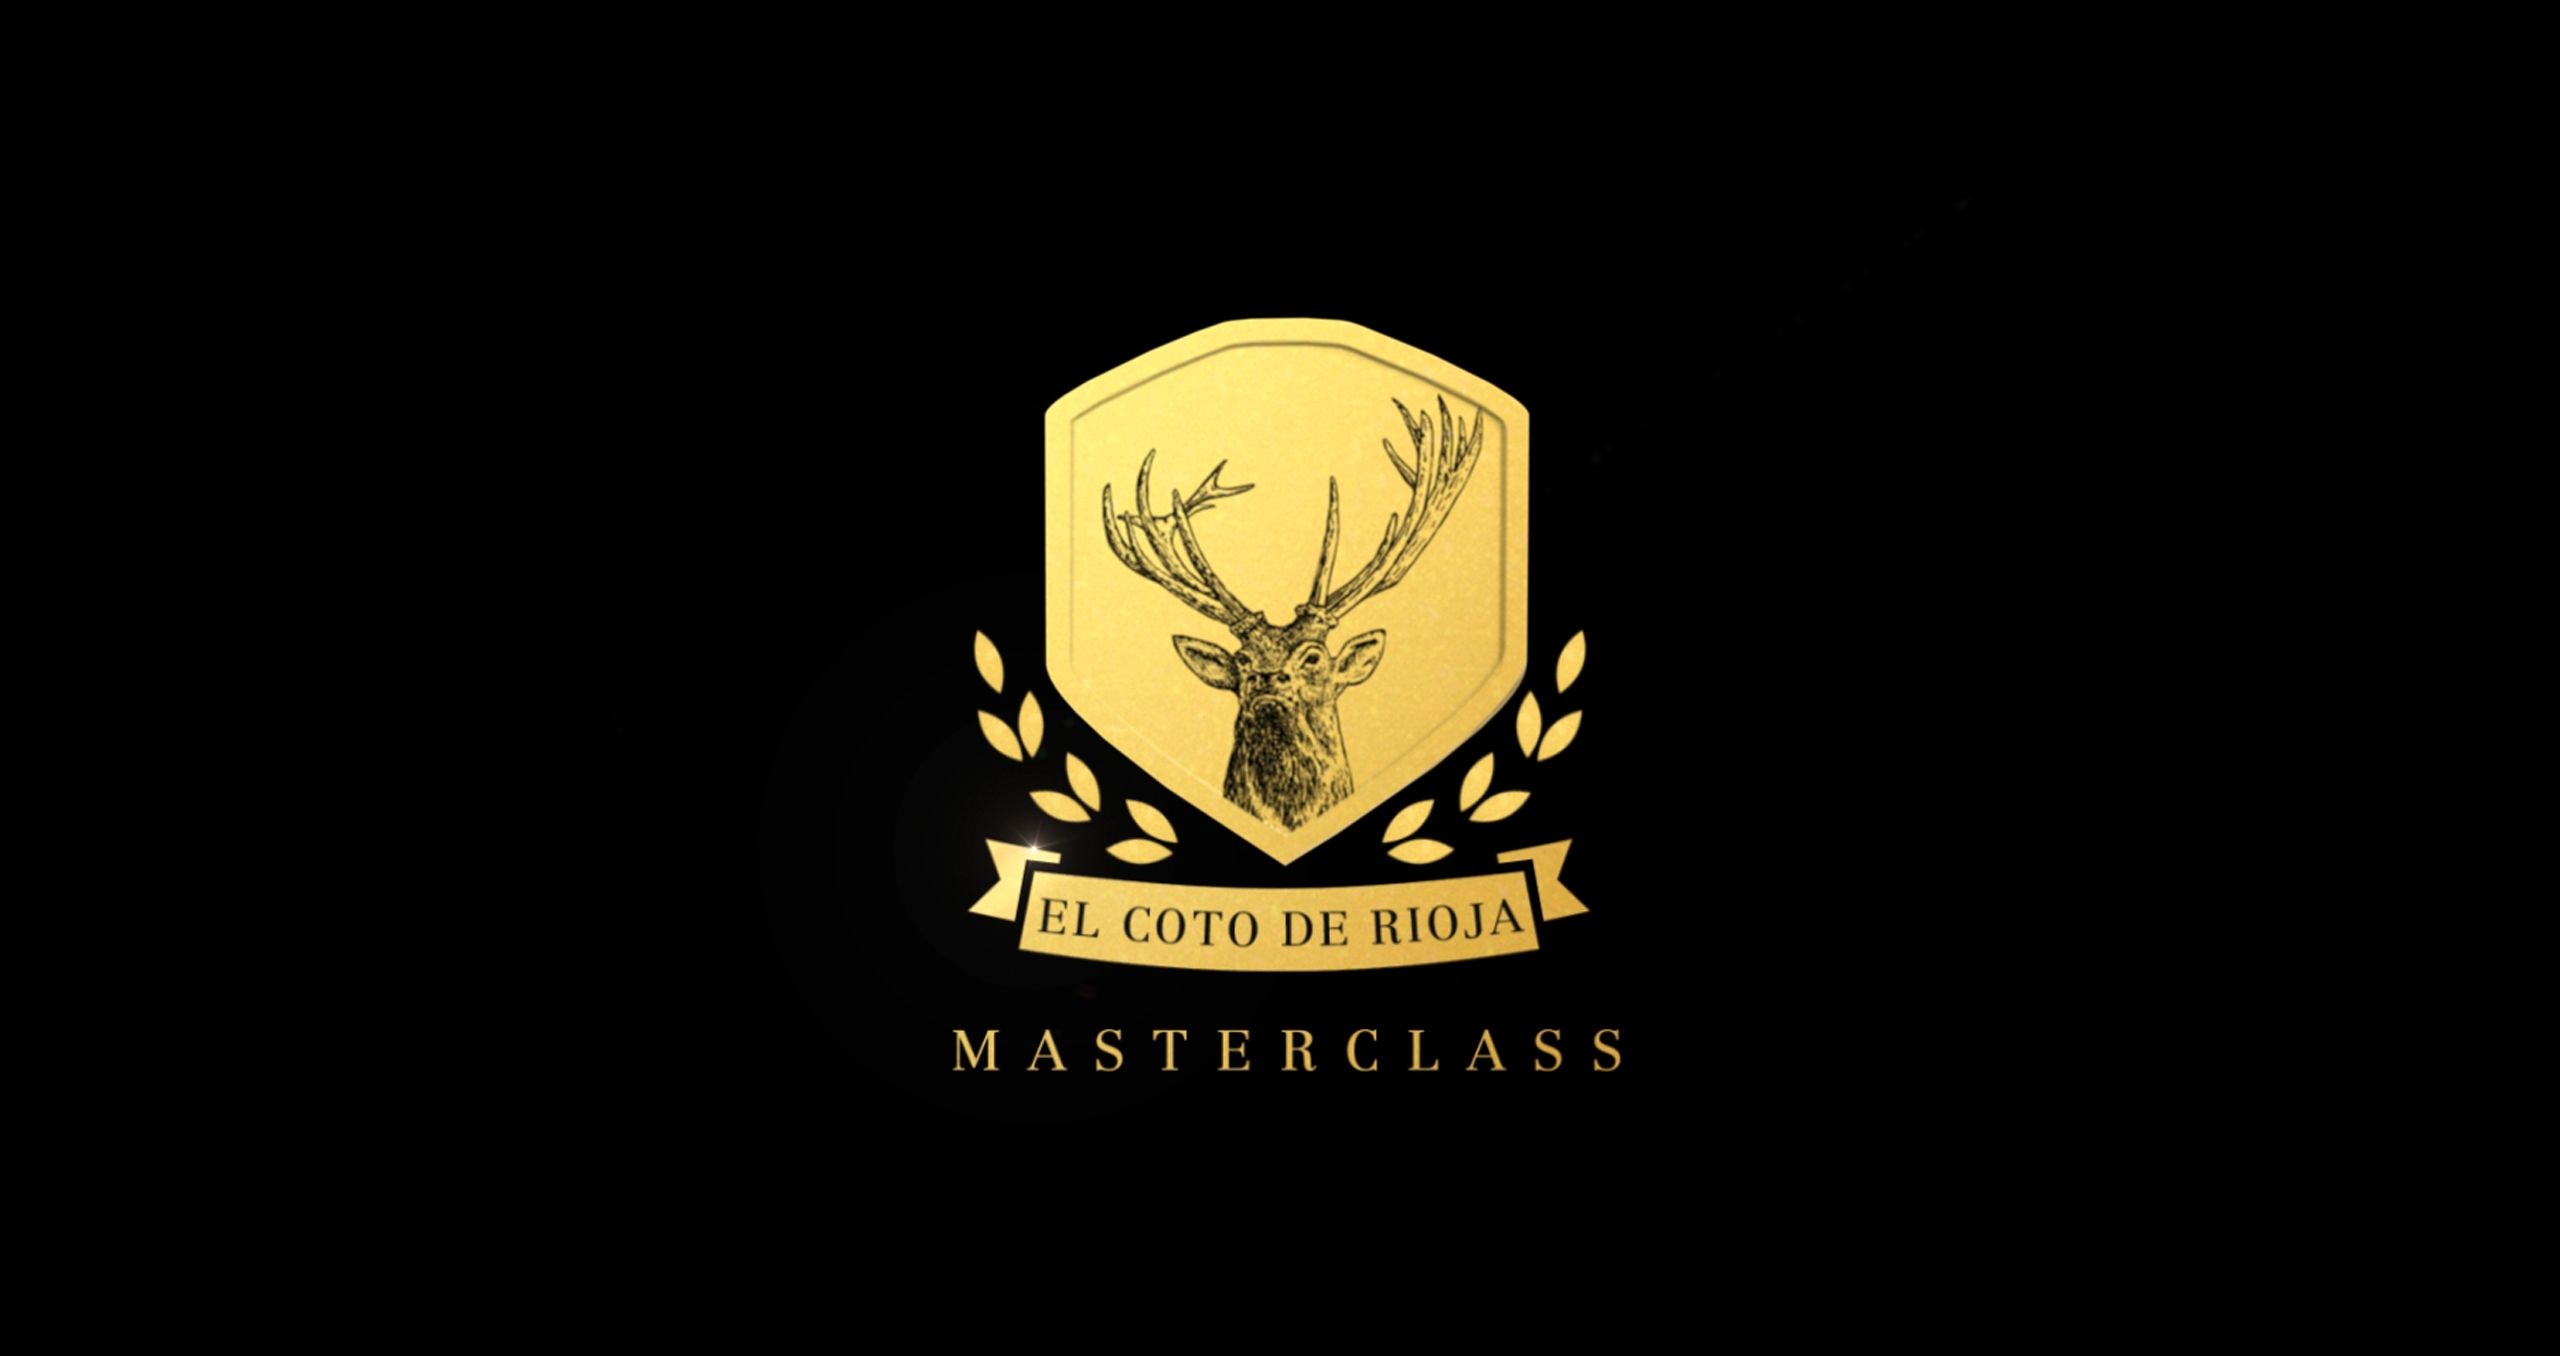 El Coto masterclass